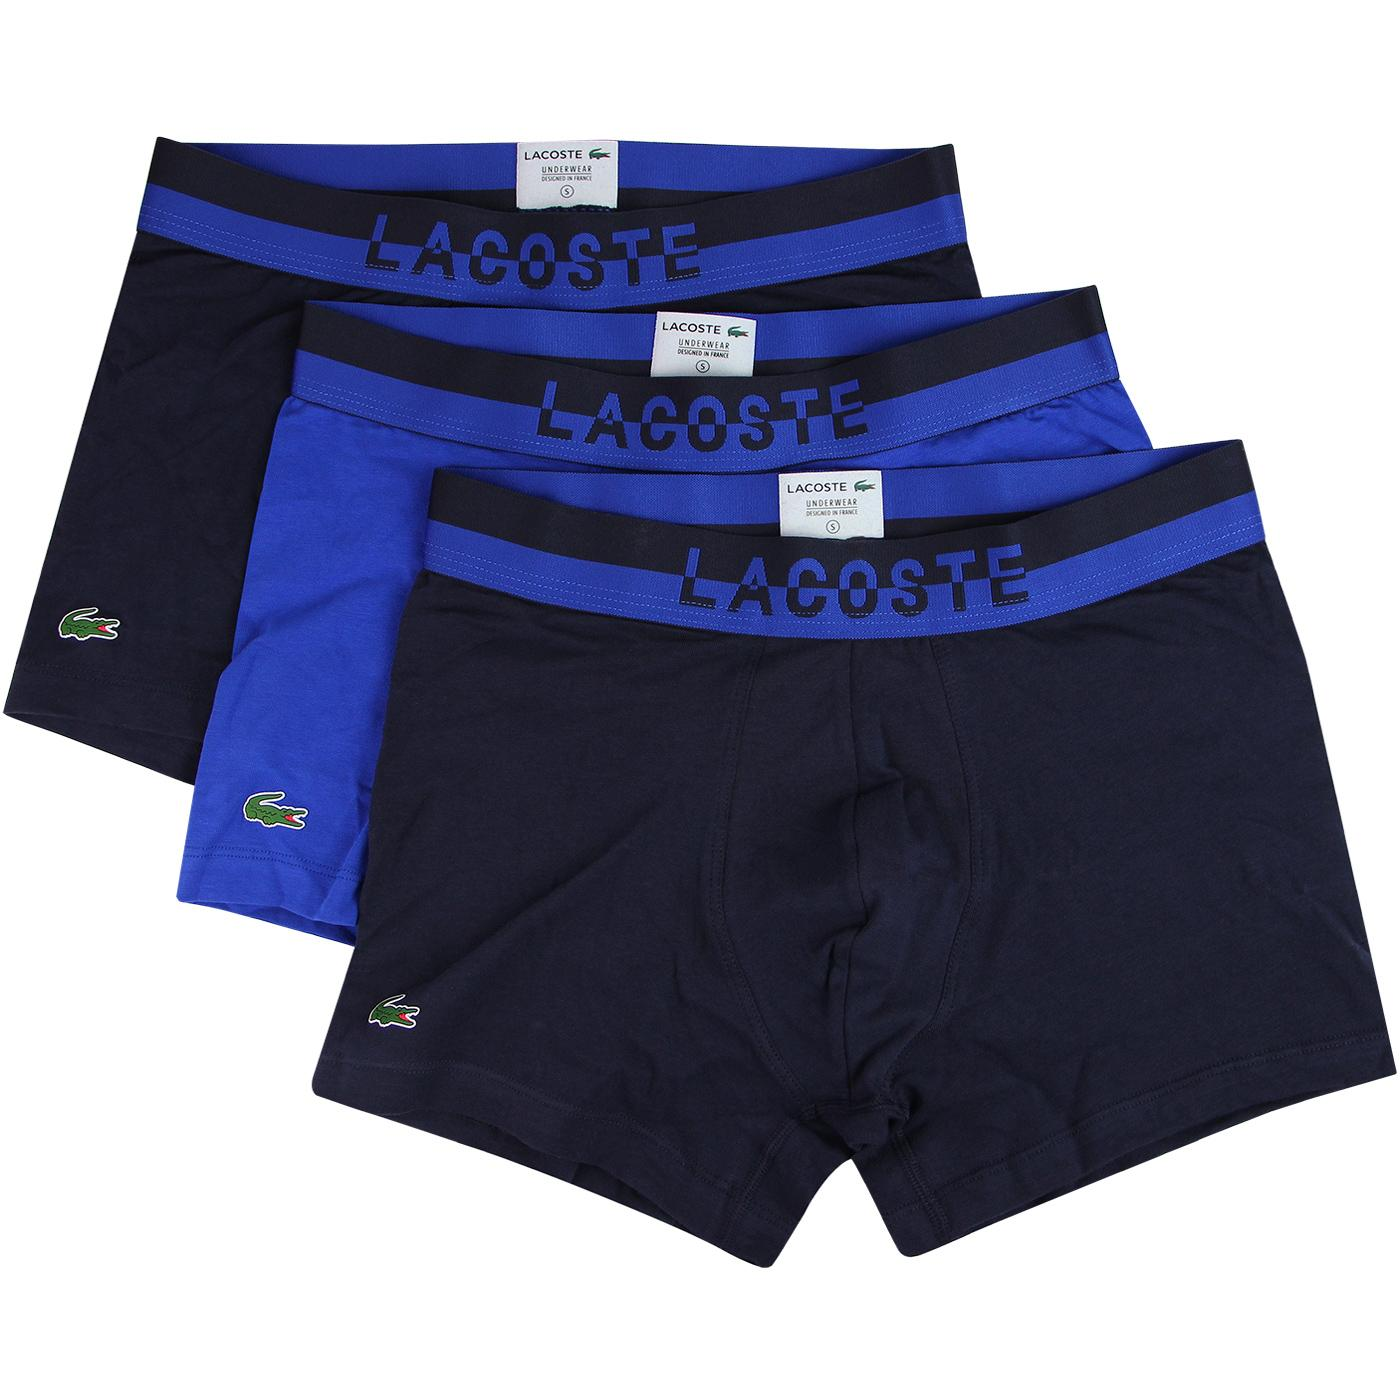 + LACOSTE Men's Contrast Stripe 3 Pack Trunks BLUE